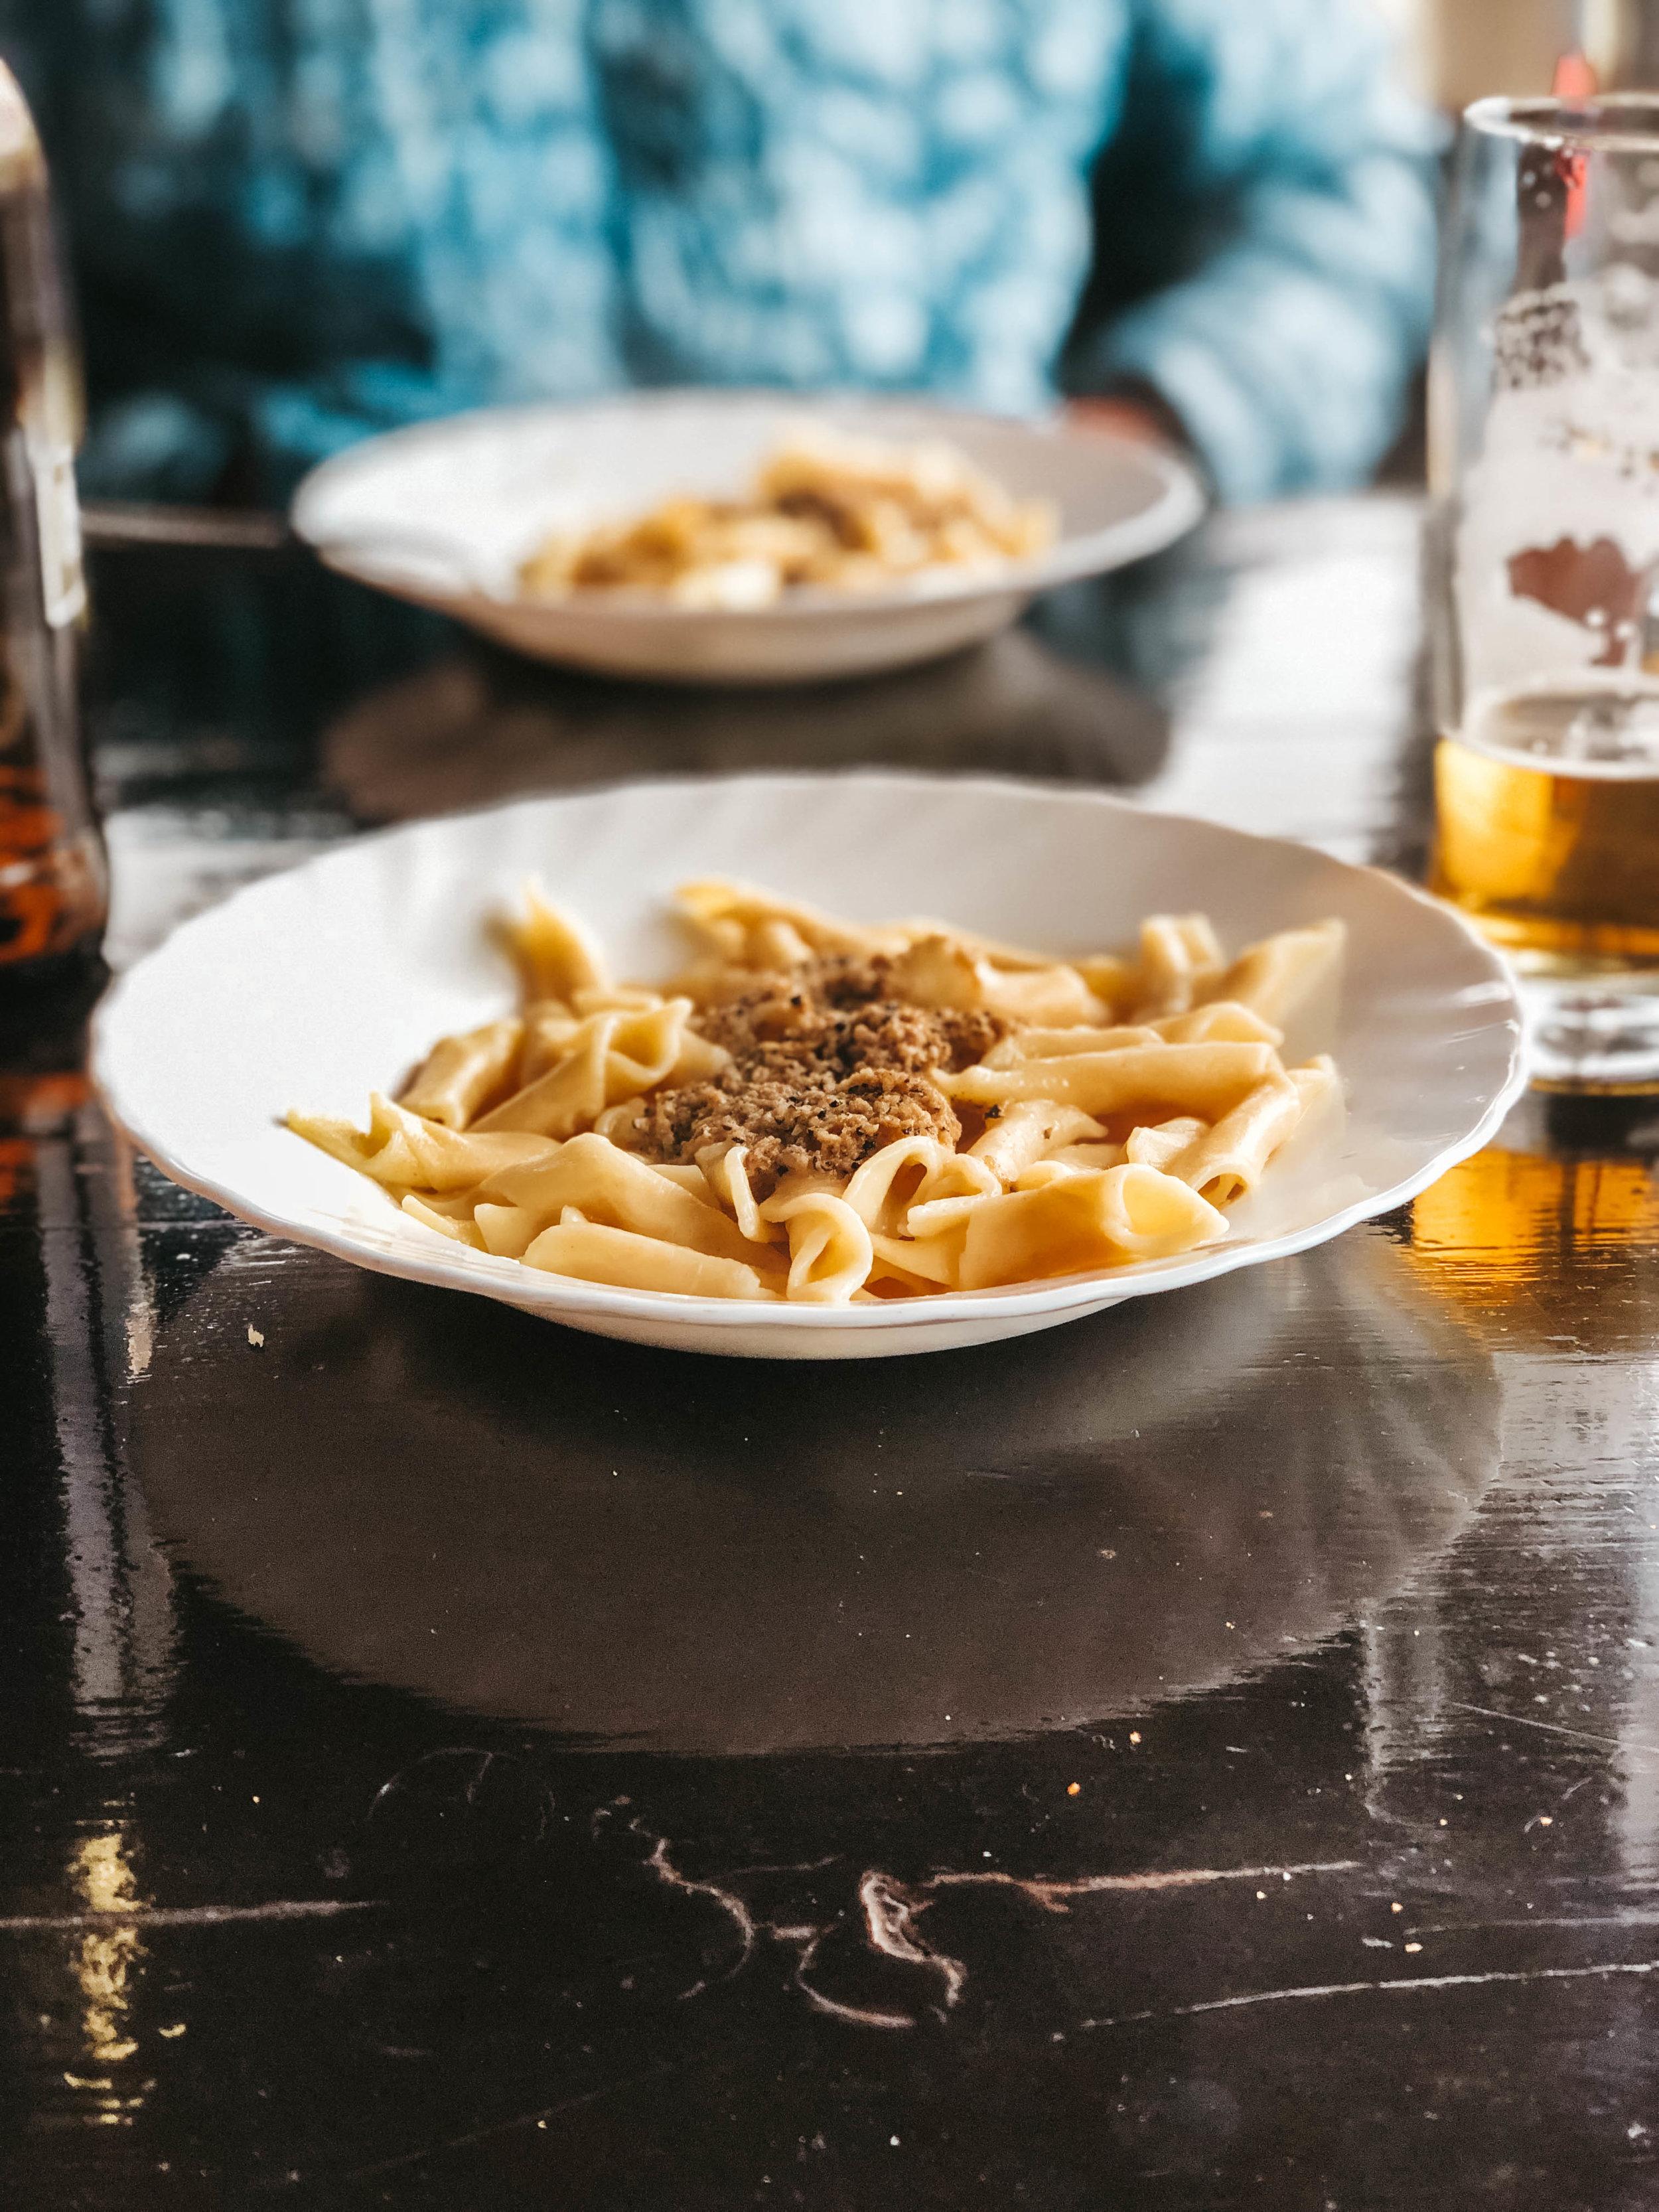 Truffle fuzi pasta in Hum, Istria, Croatia